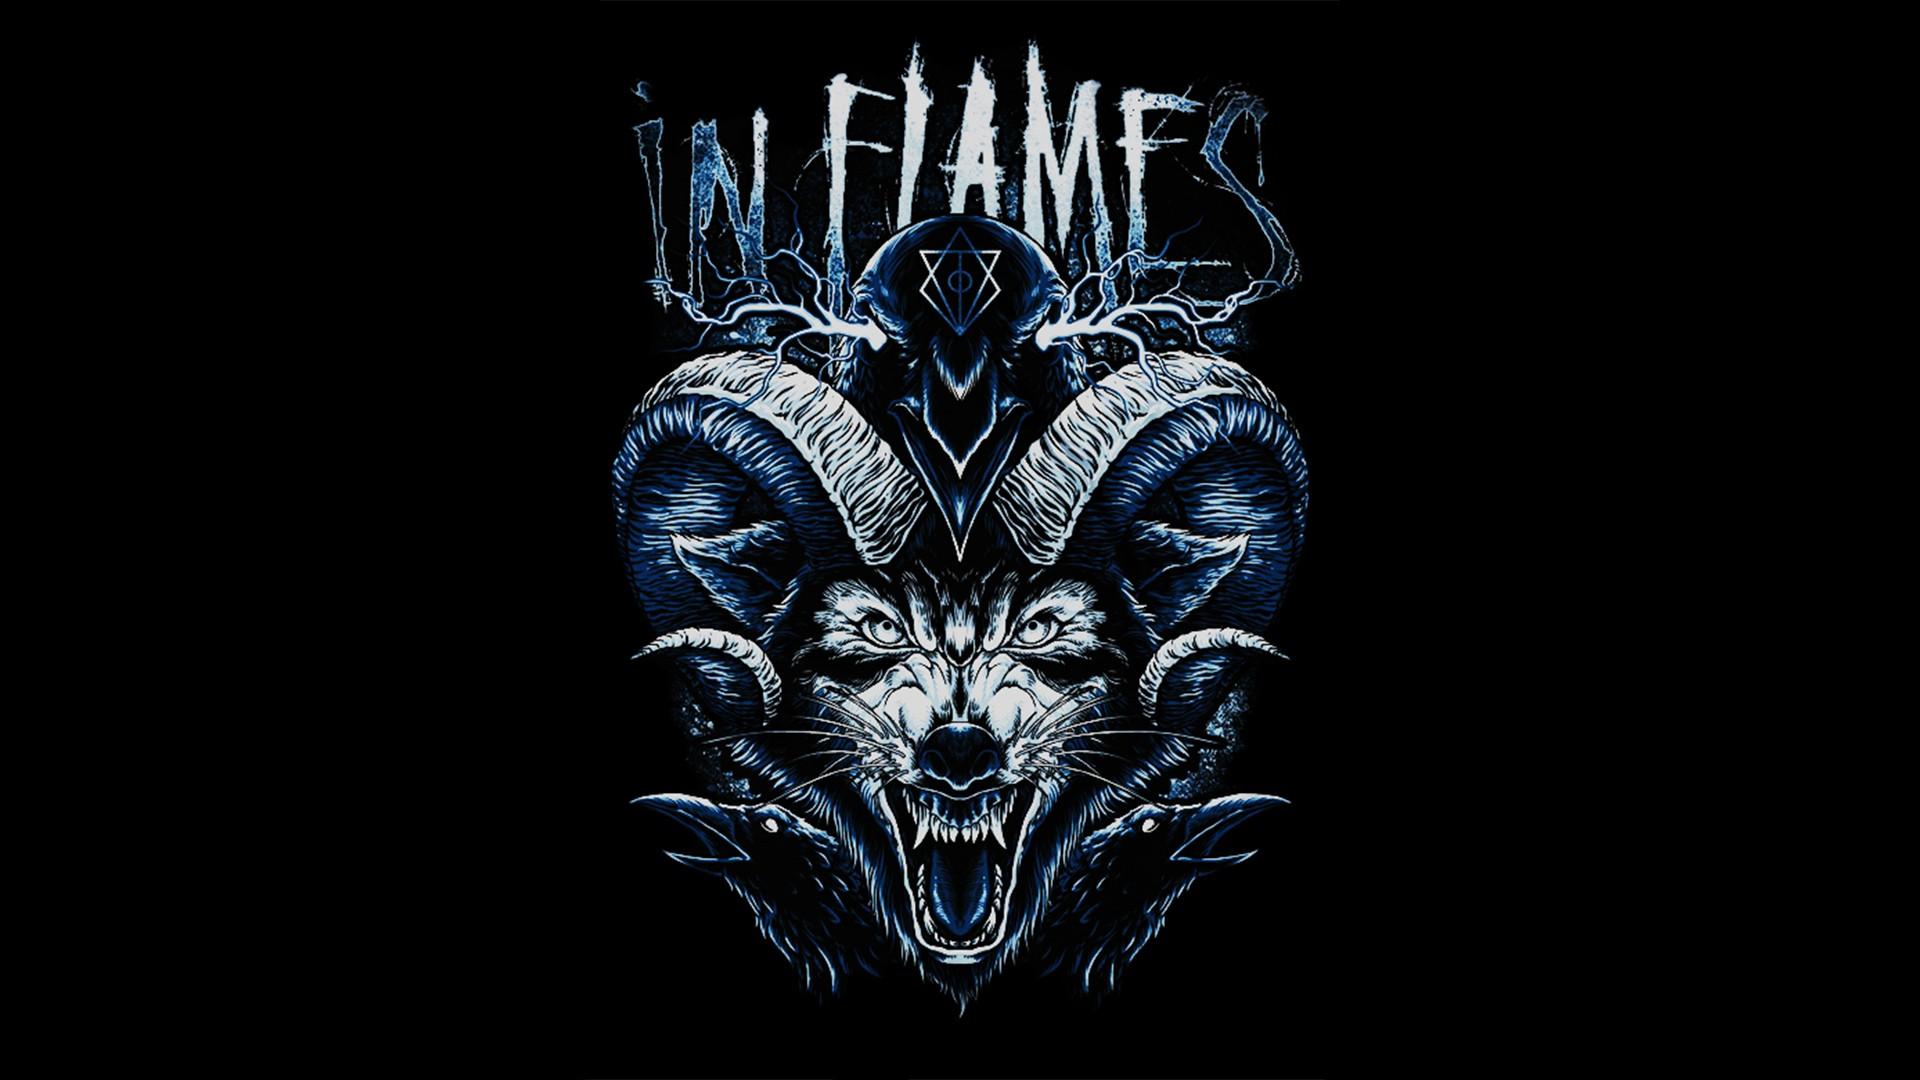 General 1920x1080 In Flames wolf raven Jesterhead metal music rock music rock bands metal band melodic death metal heavy metal alternative metal  Metalcore